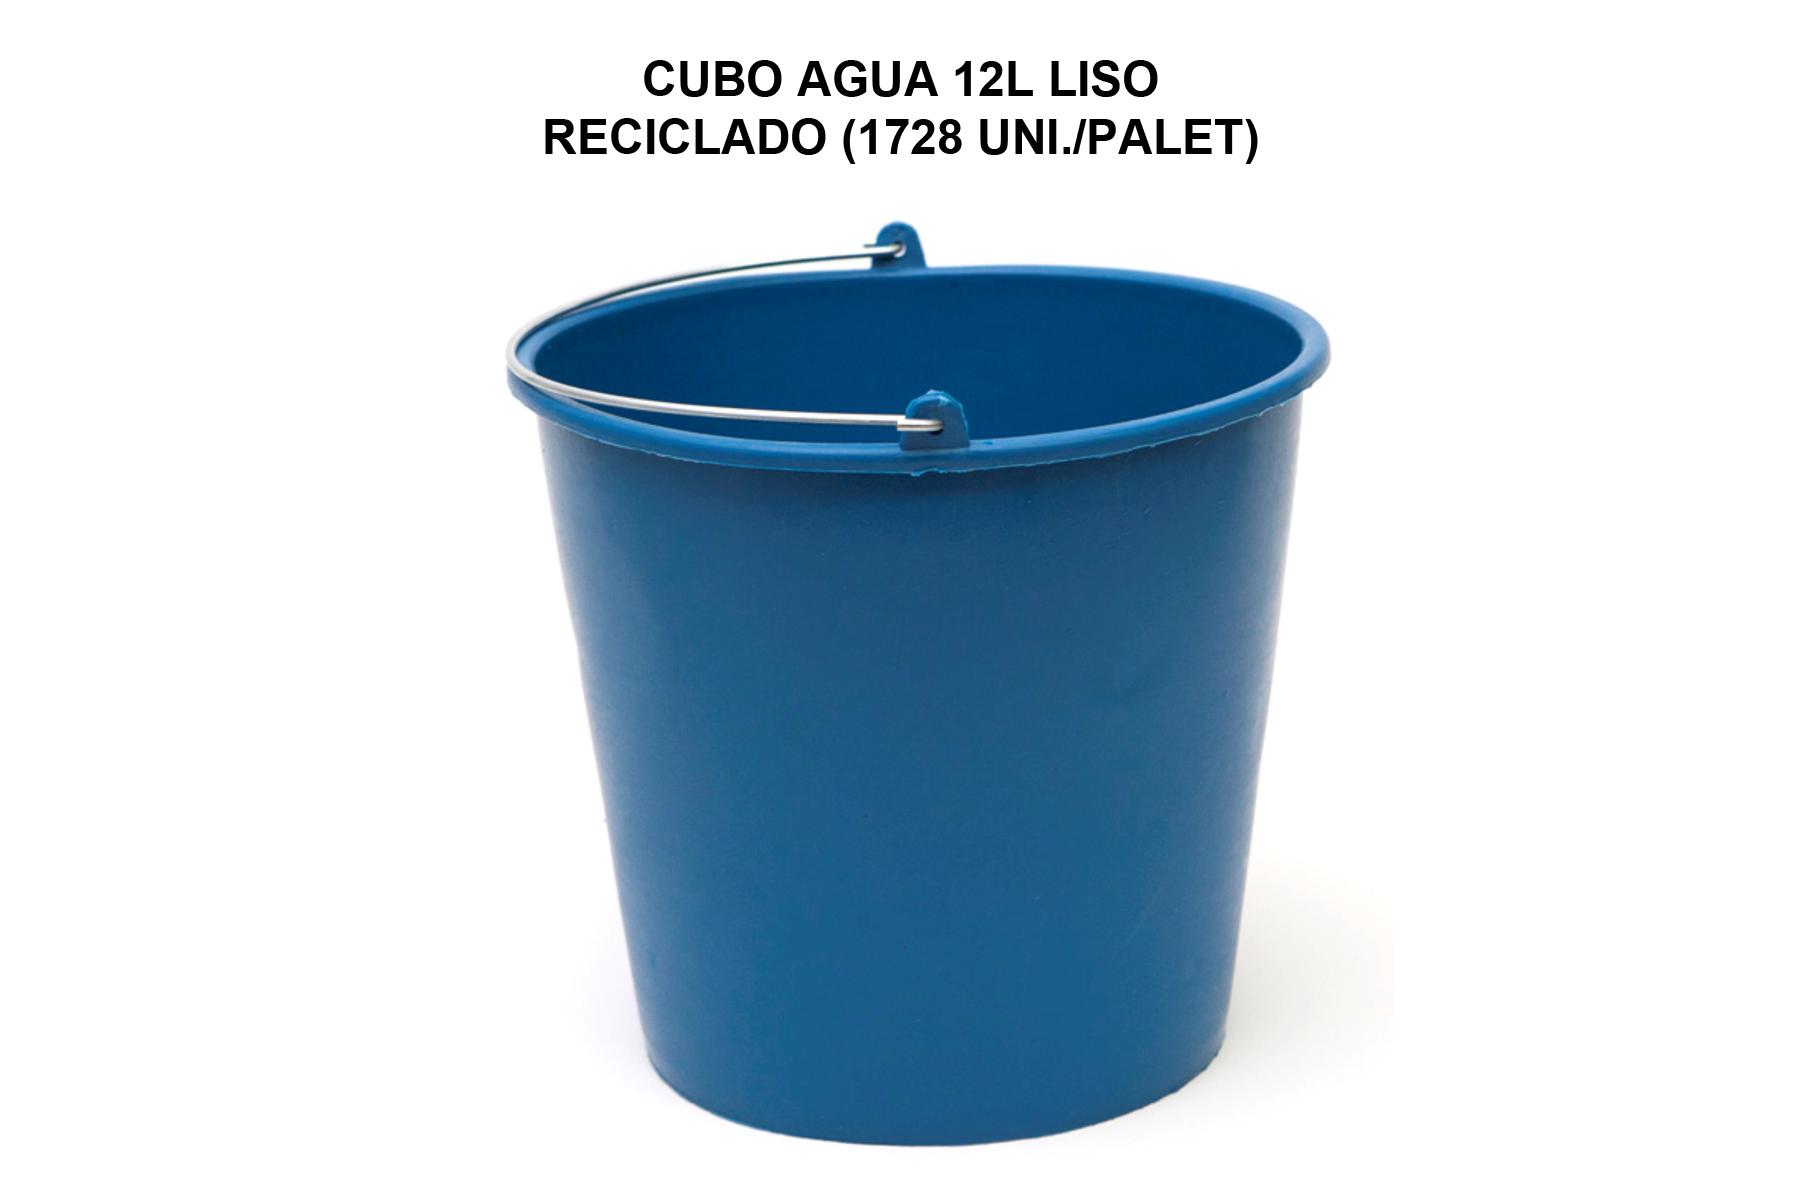 CUBO AGUA 12L LISO RECICLADO